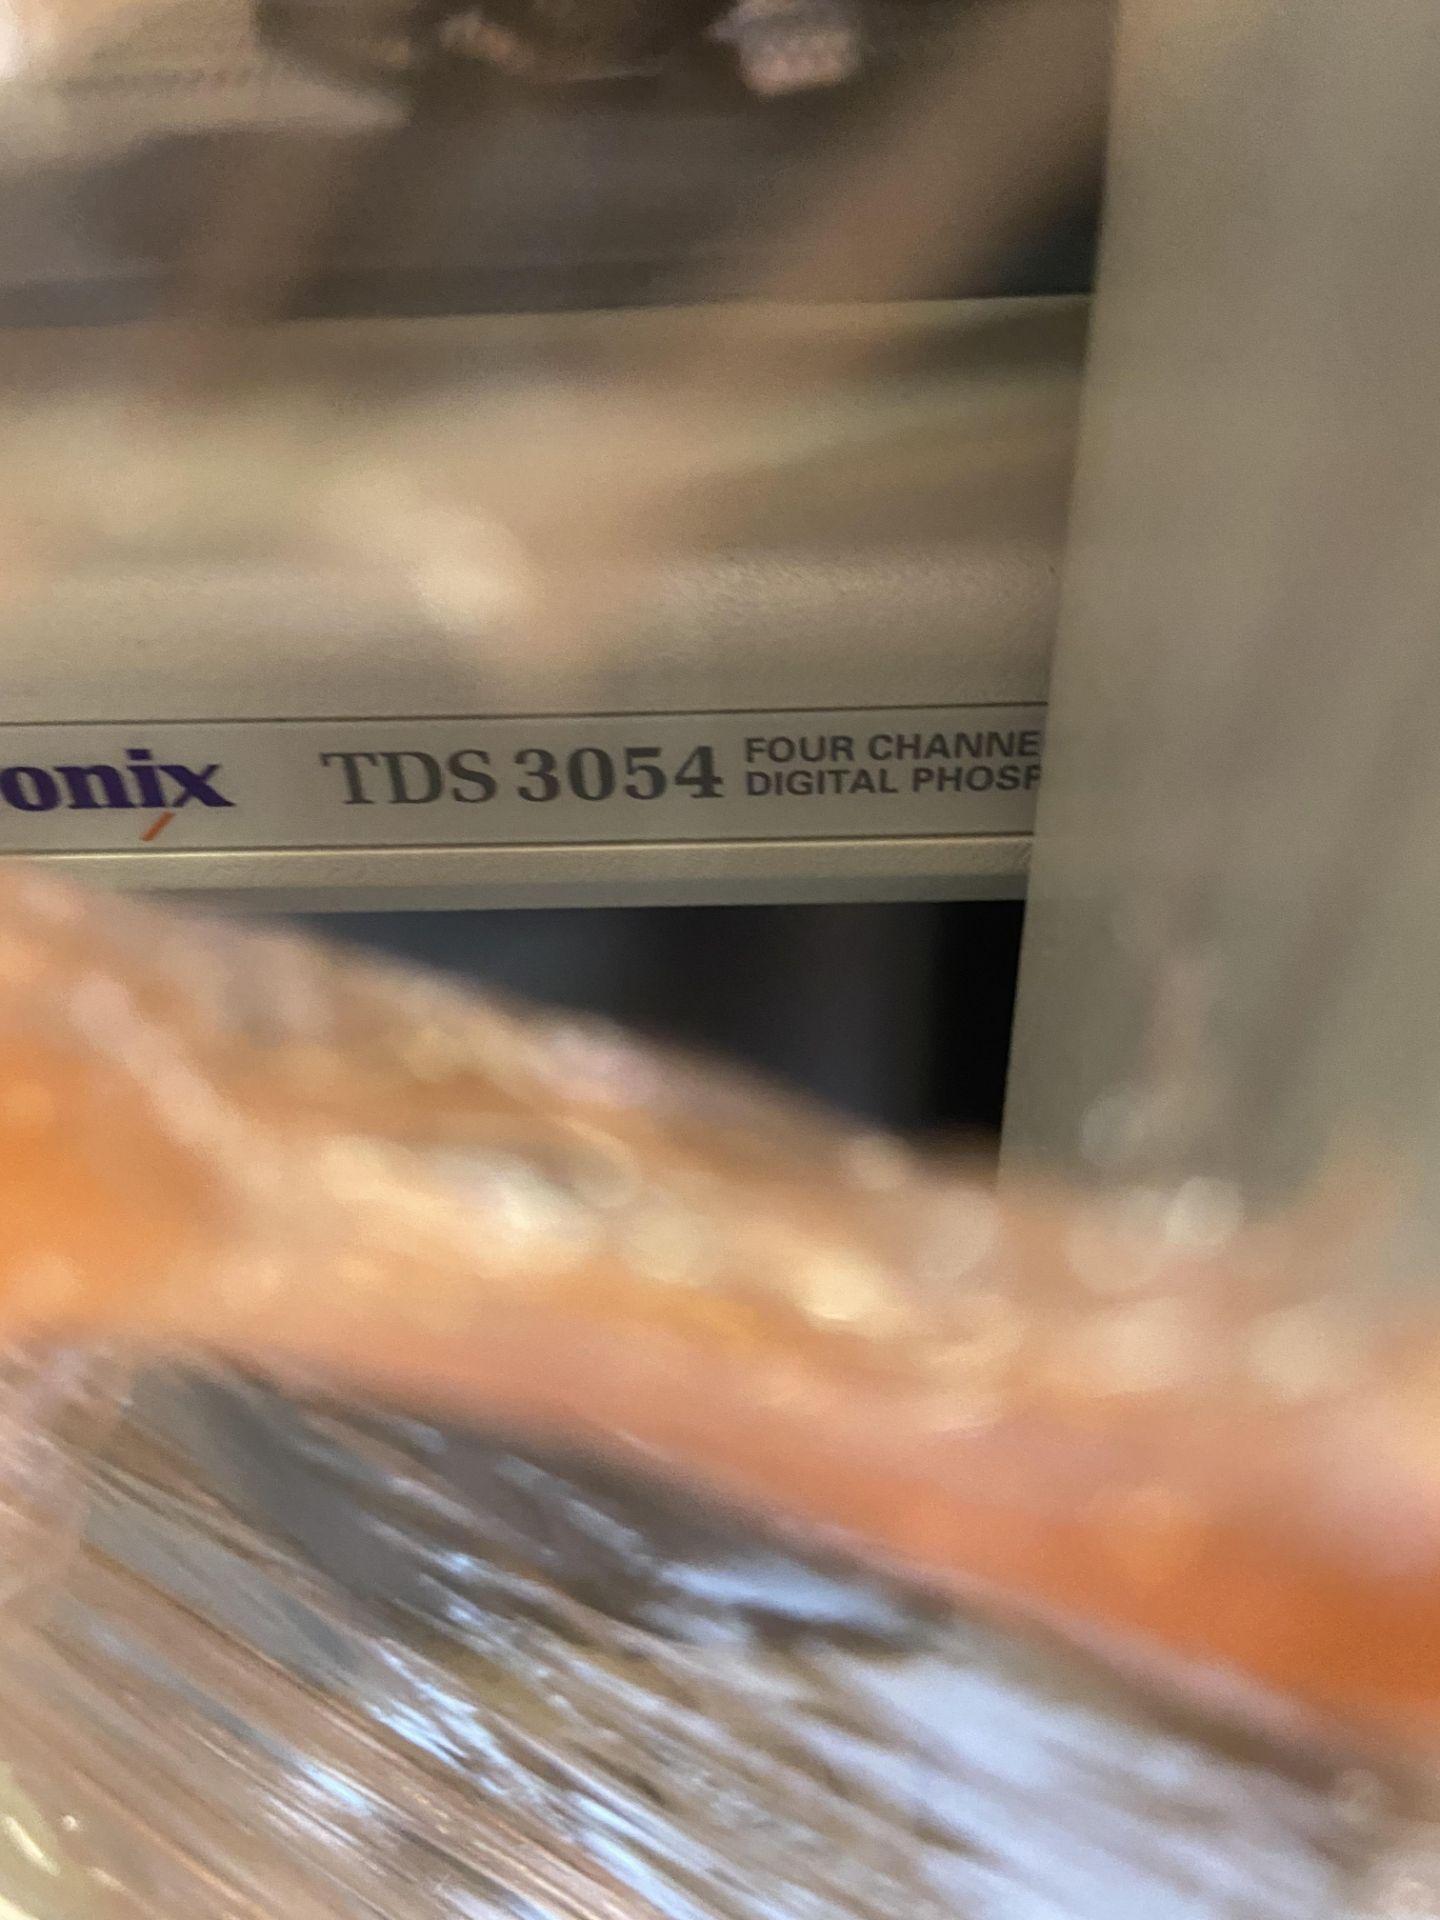 Tektronix TDS 3054 4 Channel Digital Oscilloscope, 500 MHz, Rigging Fee: $50 - Image 2 of 3